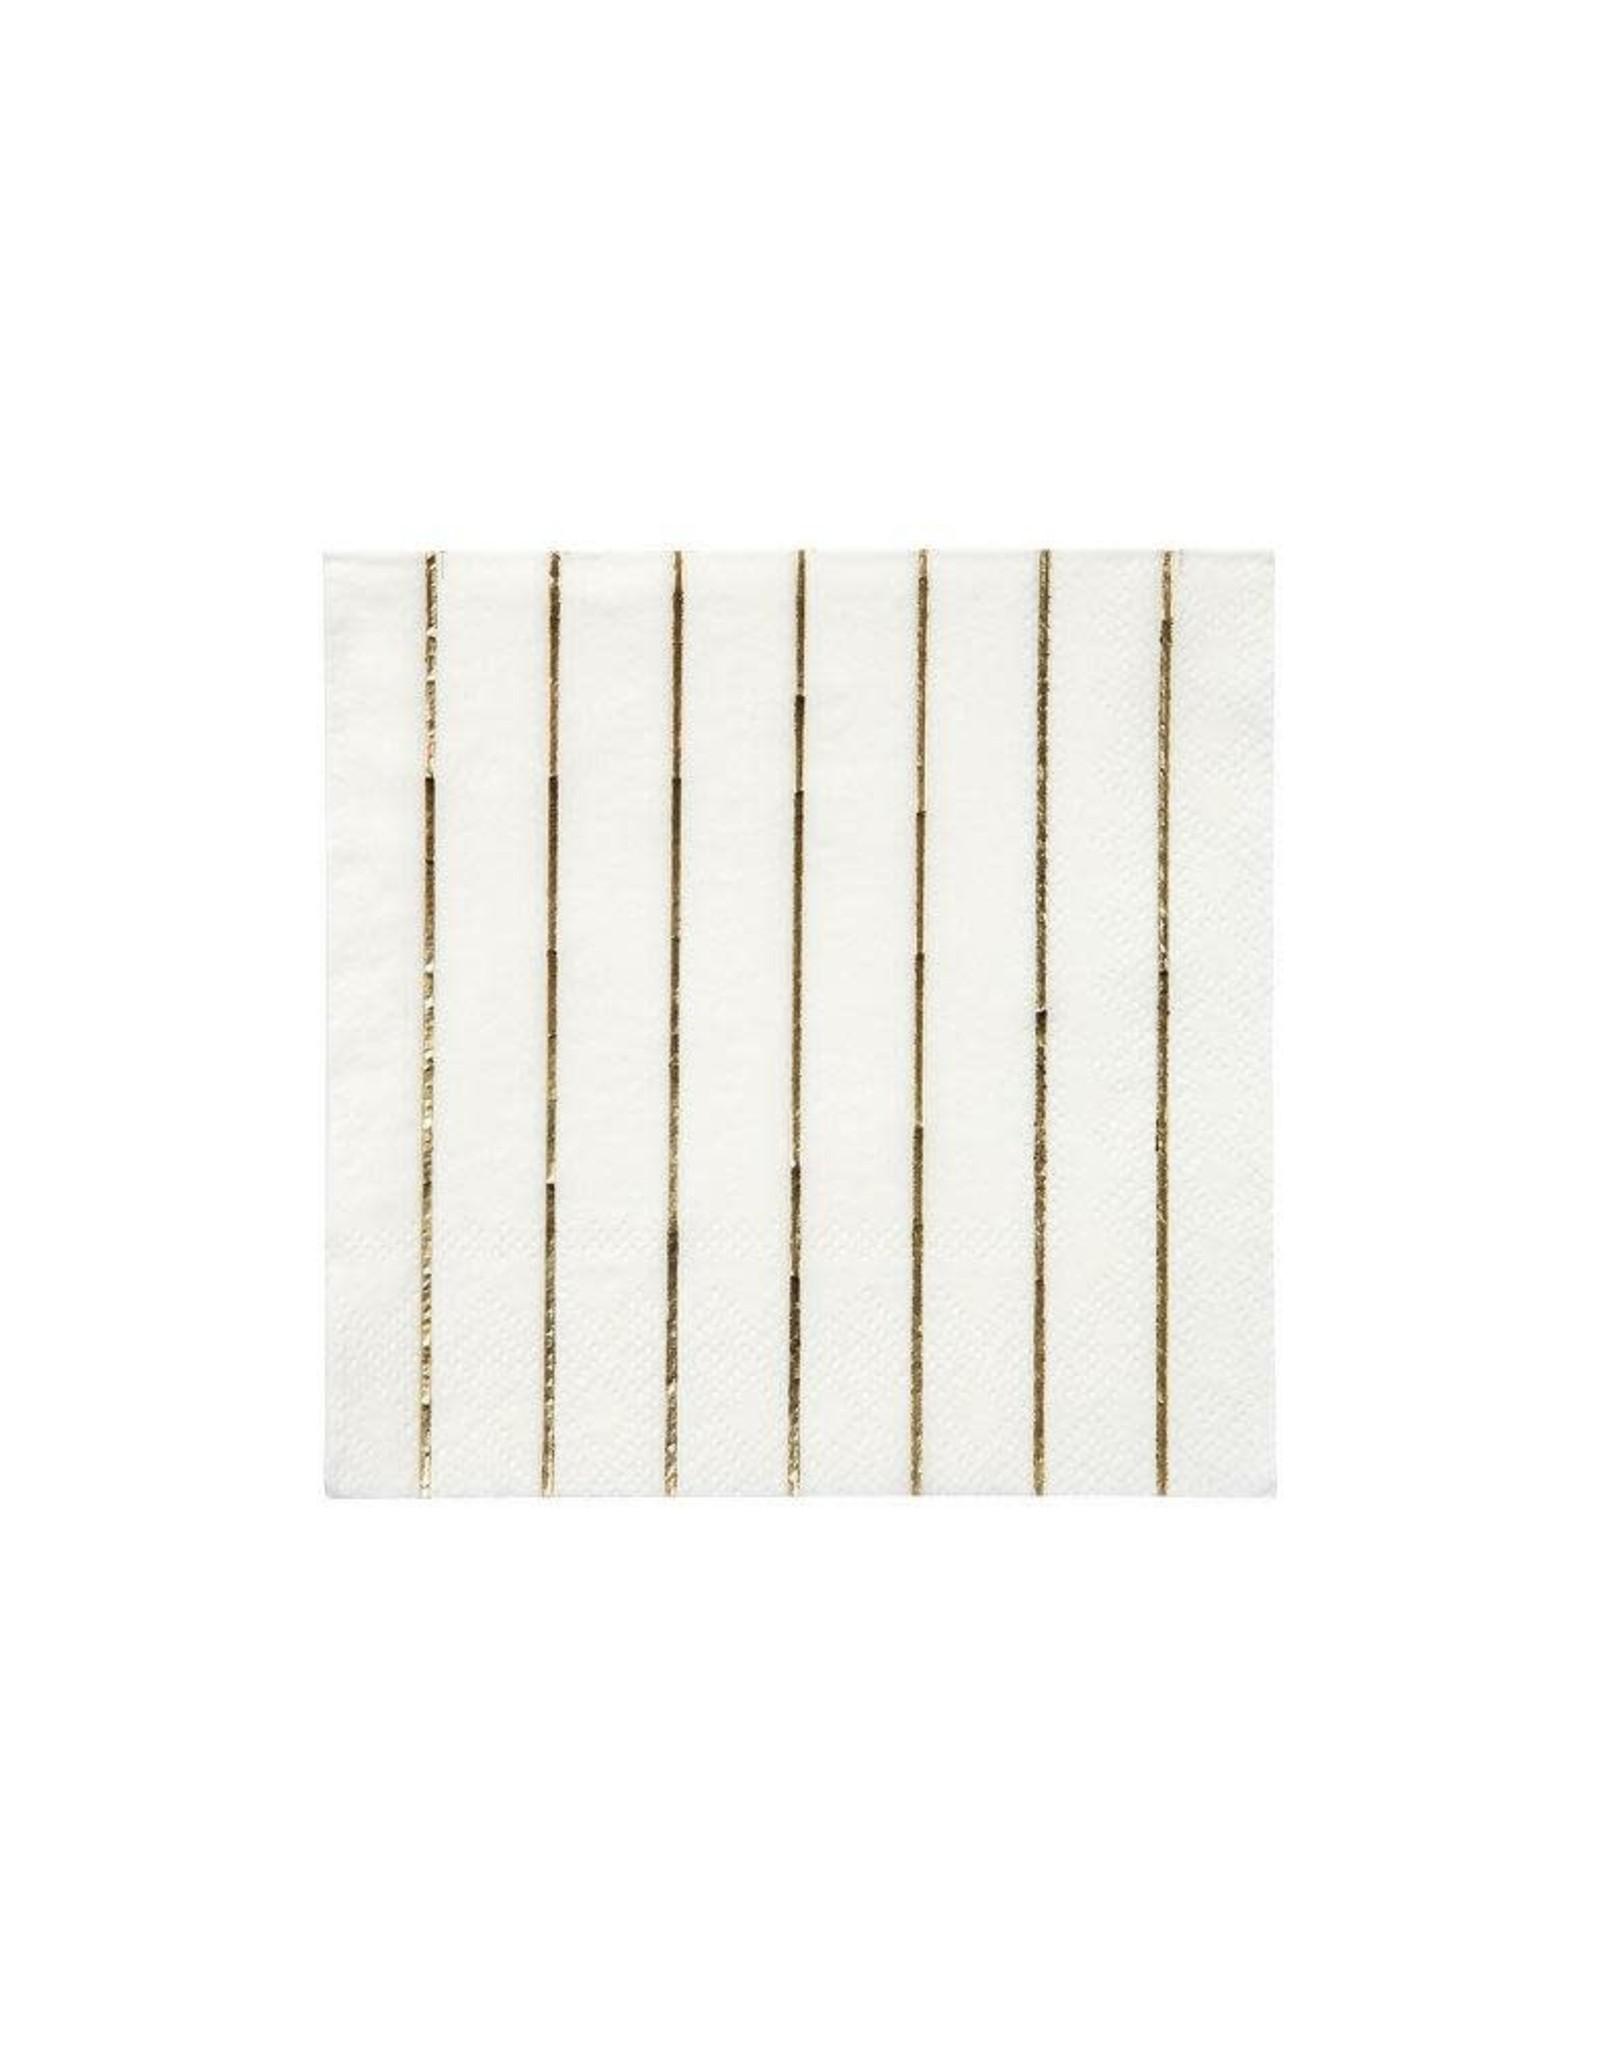 Meri Meri Meri Meri   Gold Stripe Small Napkins (set of 16)